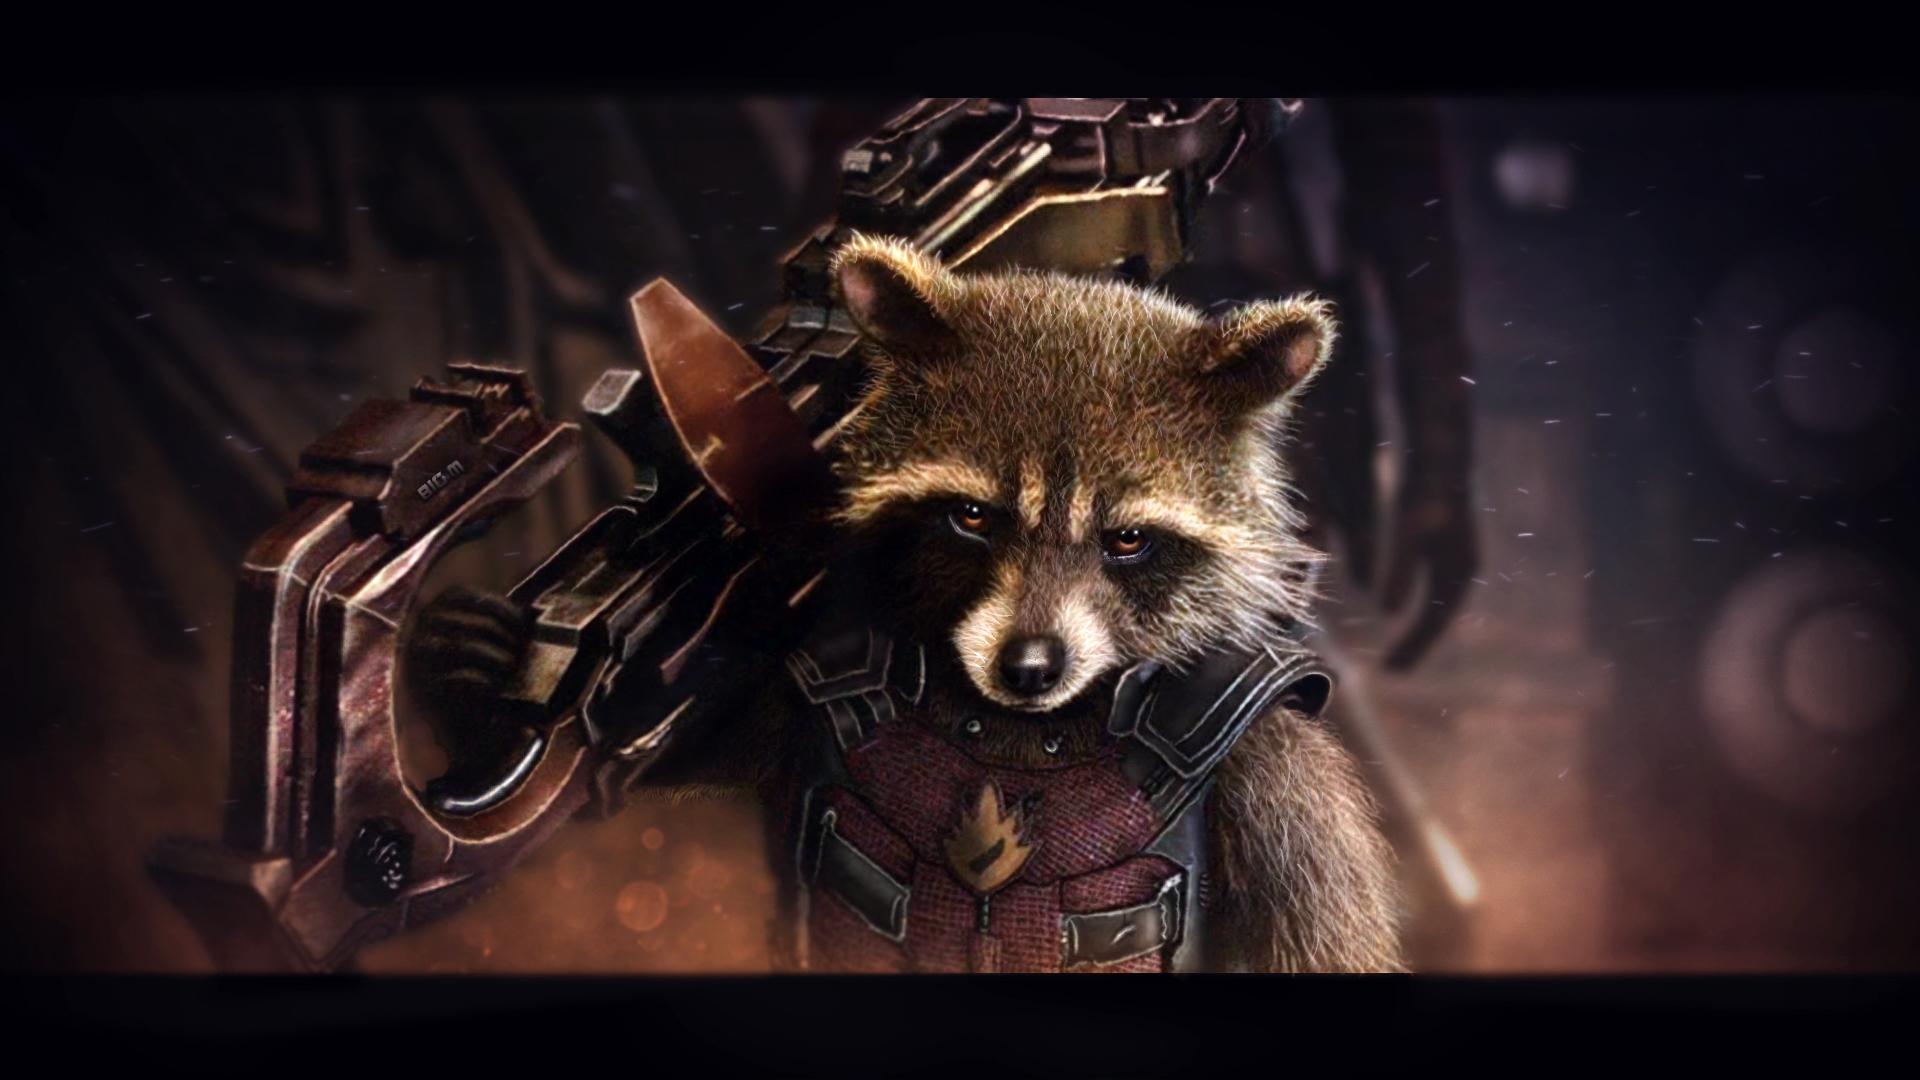 Rocket Raccoon Wallpaper 7 By BiigM